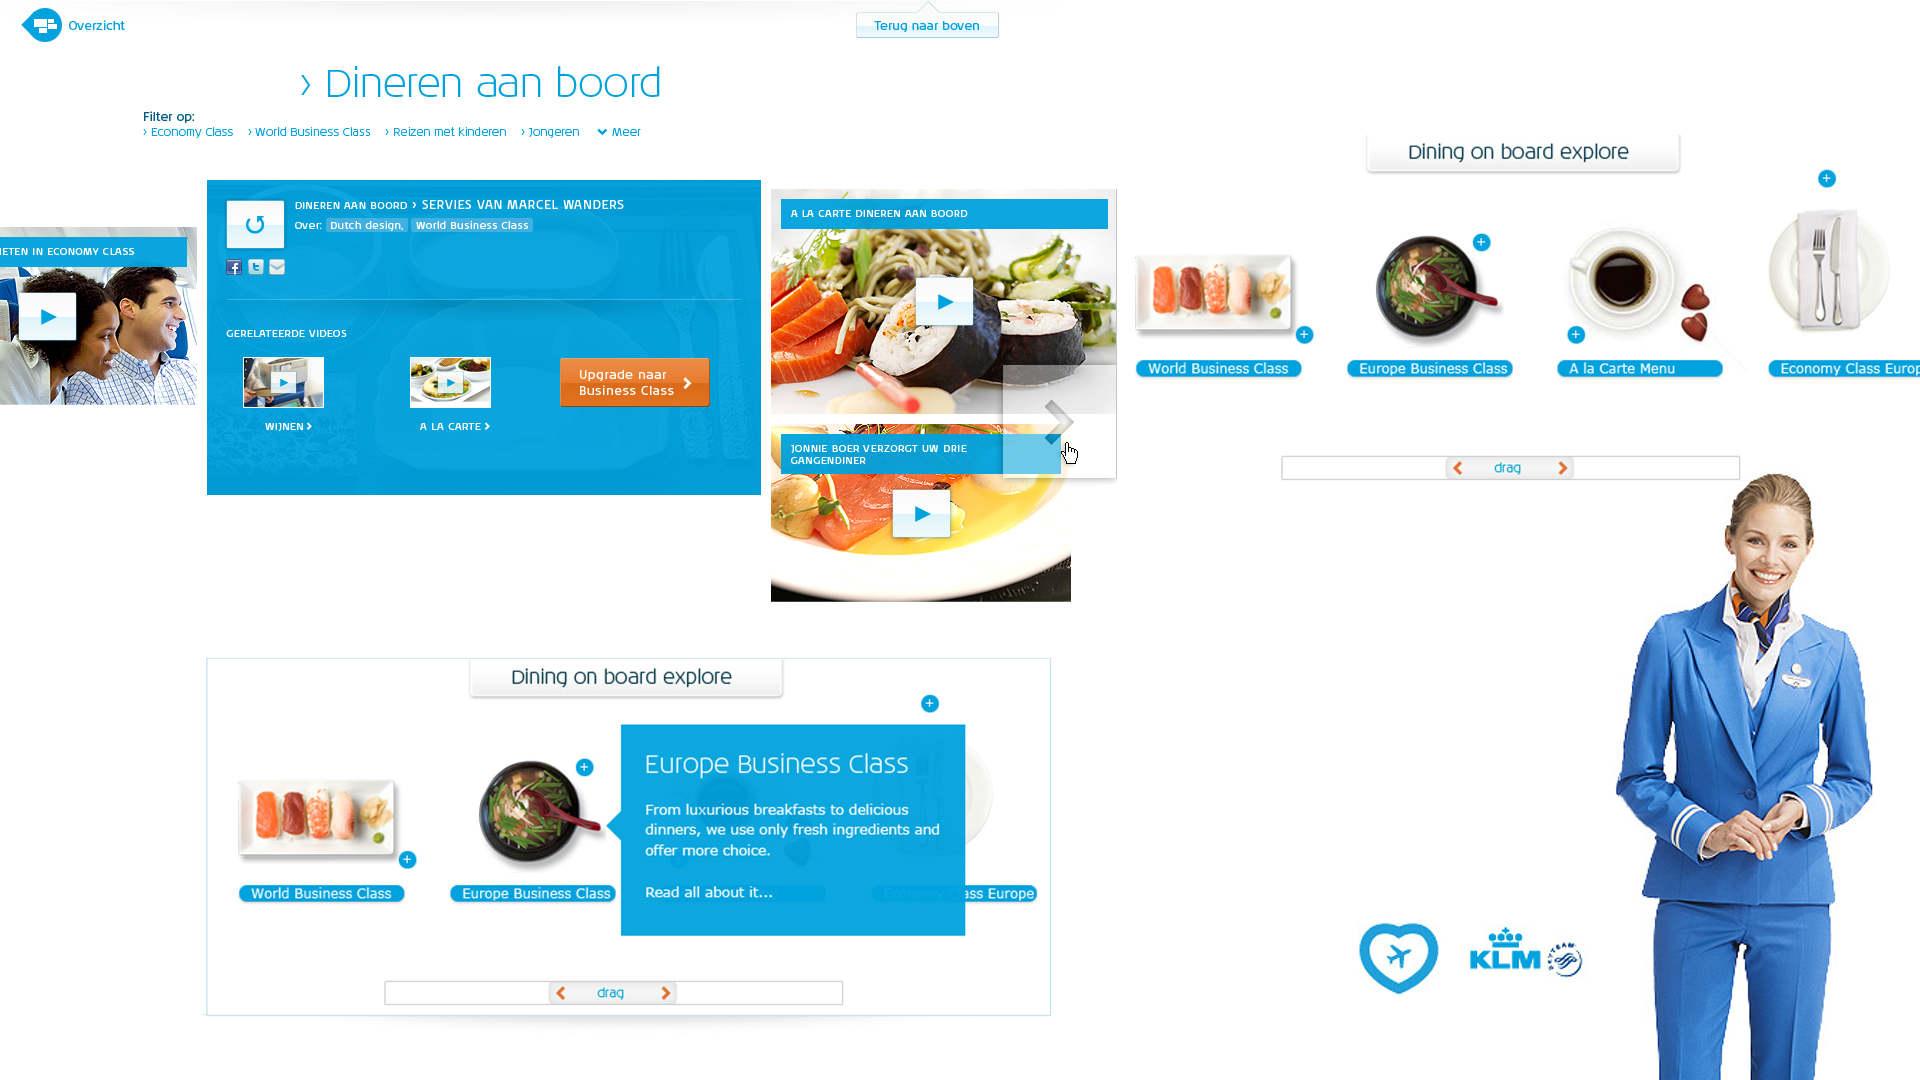 KLM Royal Dutch Airlines - Online Marketing Design Art Direction - Sham Ramessar